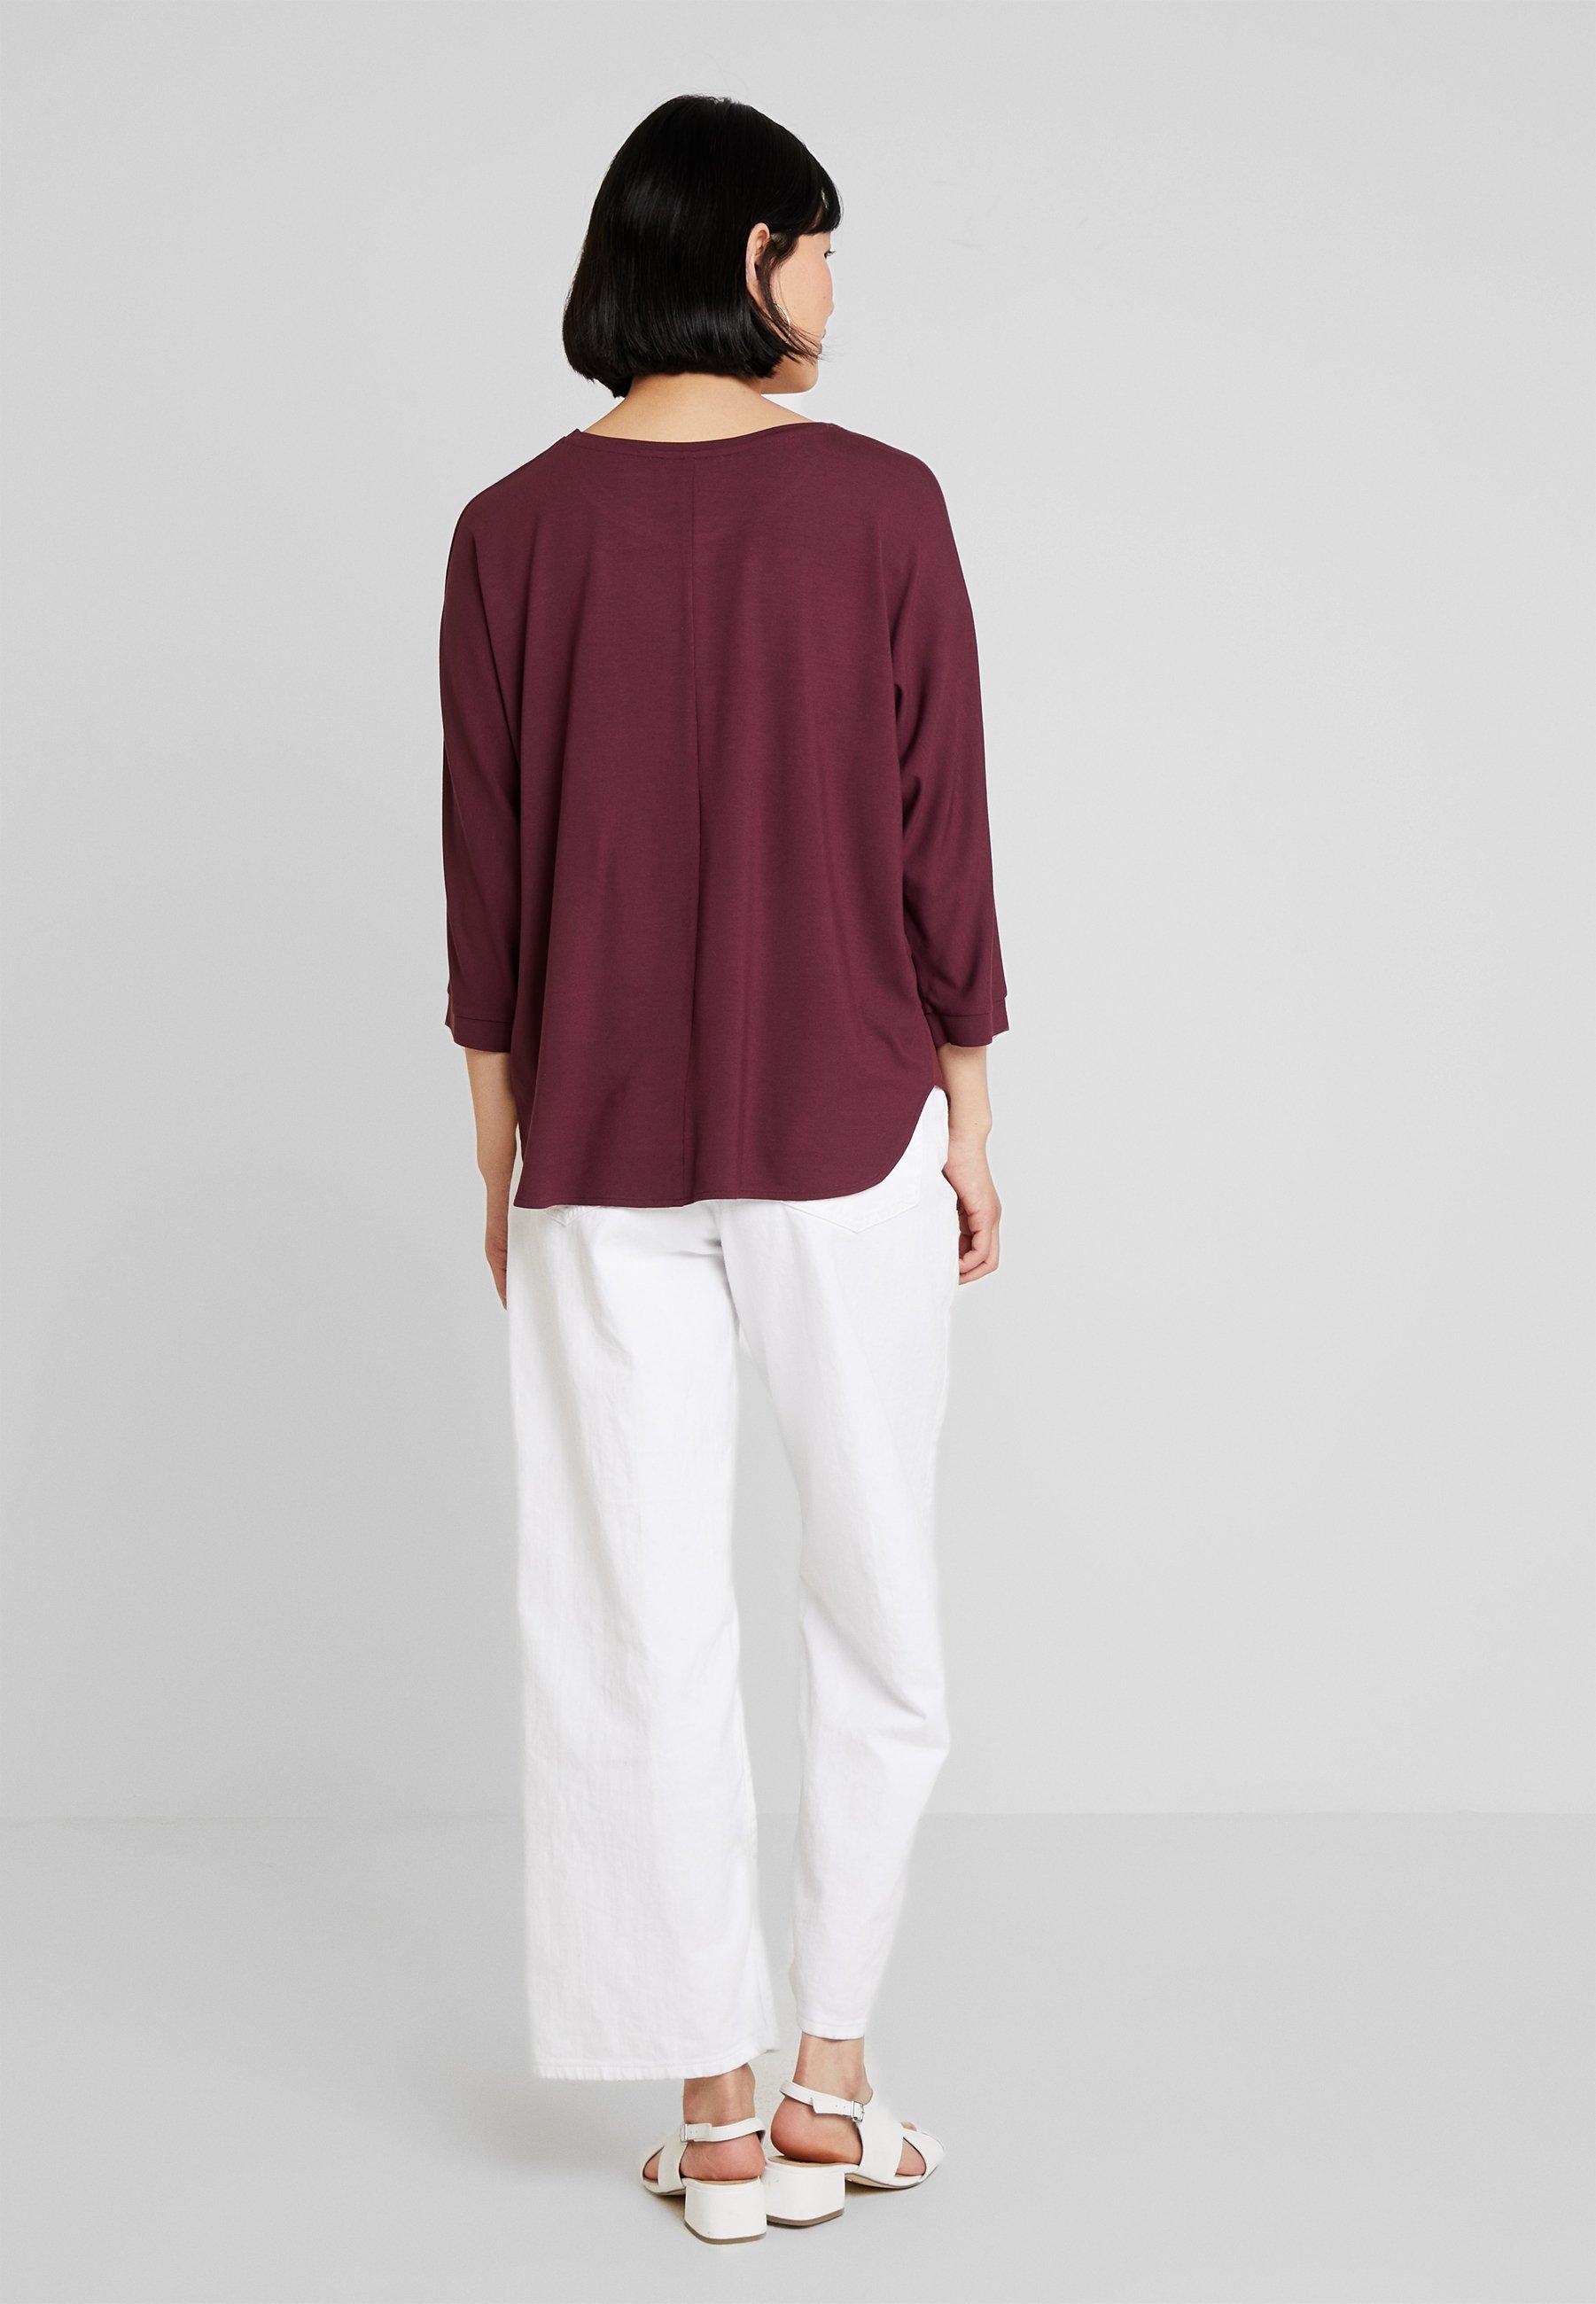 Manches T shirt À Red Bettyamp; LonguesPurple Co zVqUMSGp